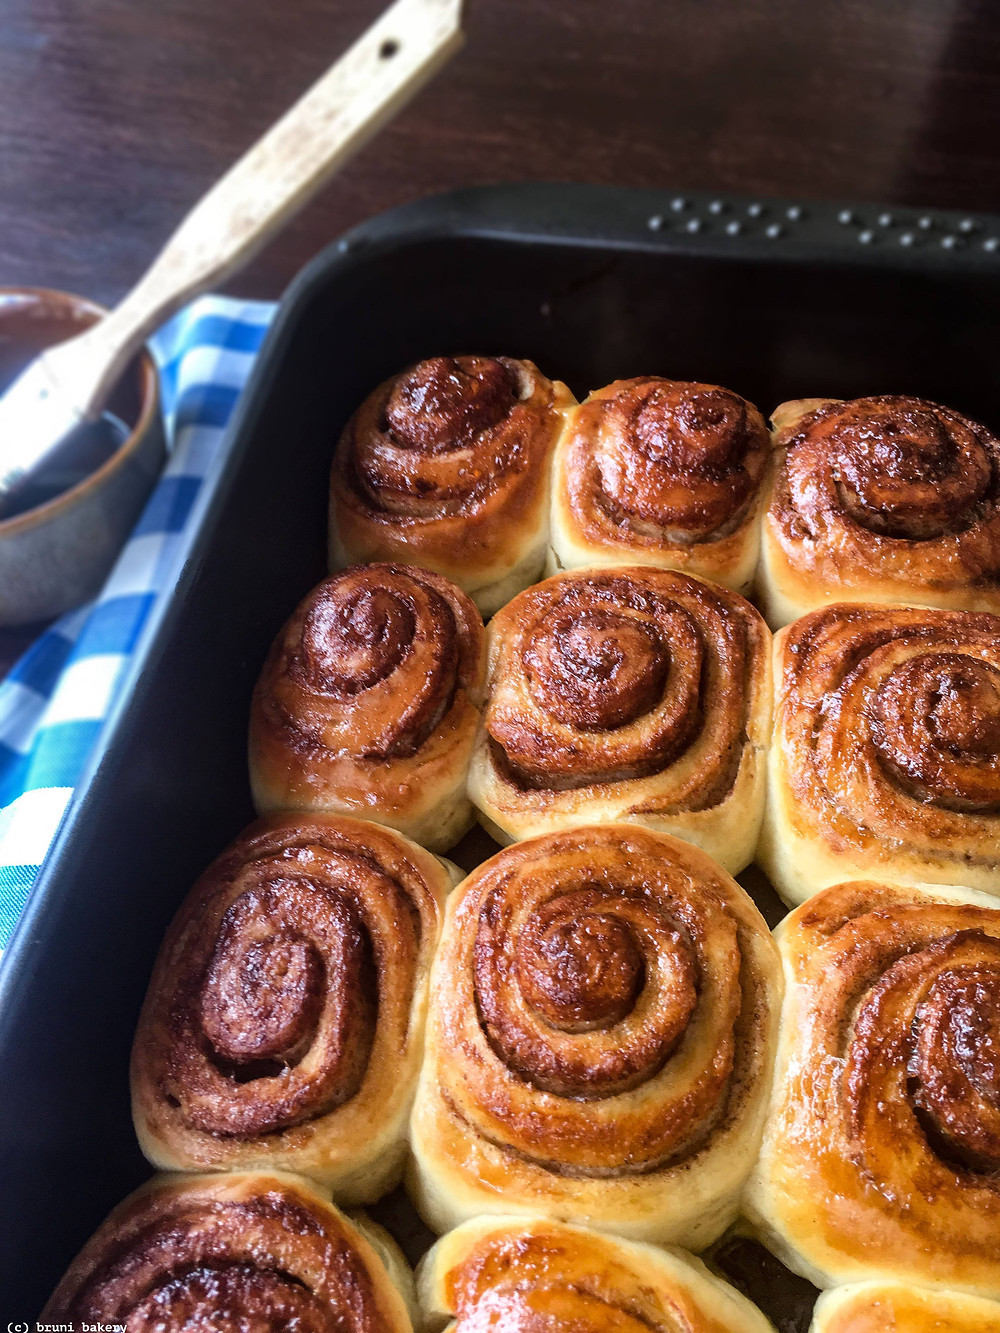 Mini Cinnamon and Cardamom Rolls with Brown Sugar Glaze